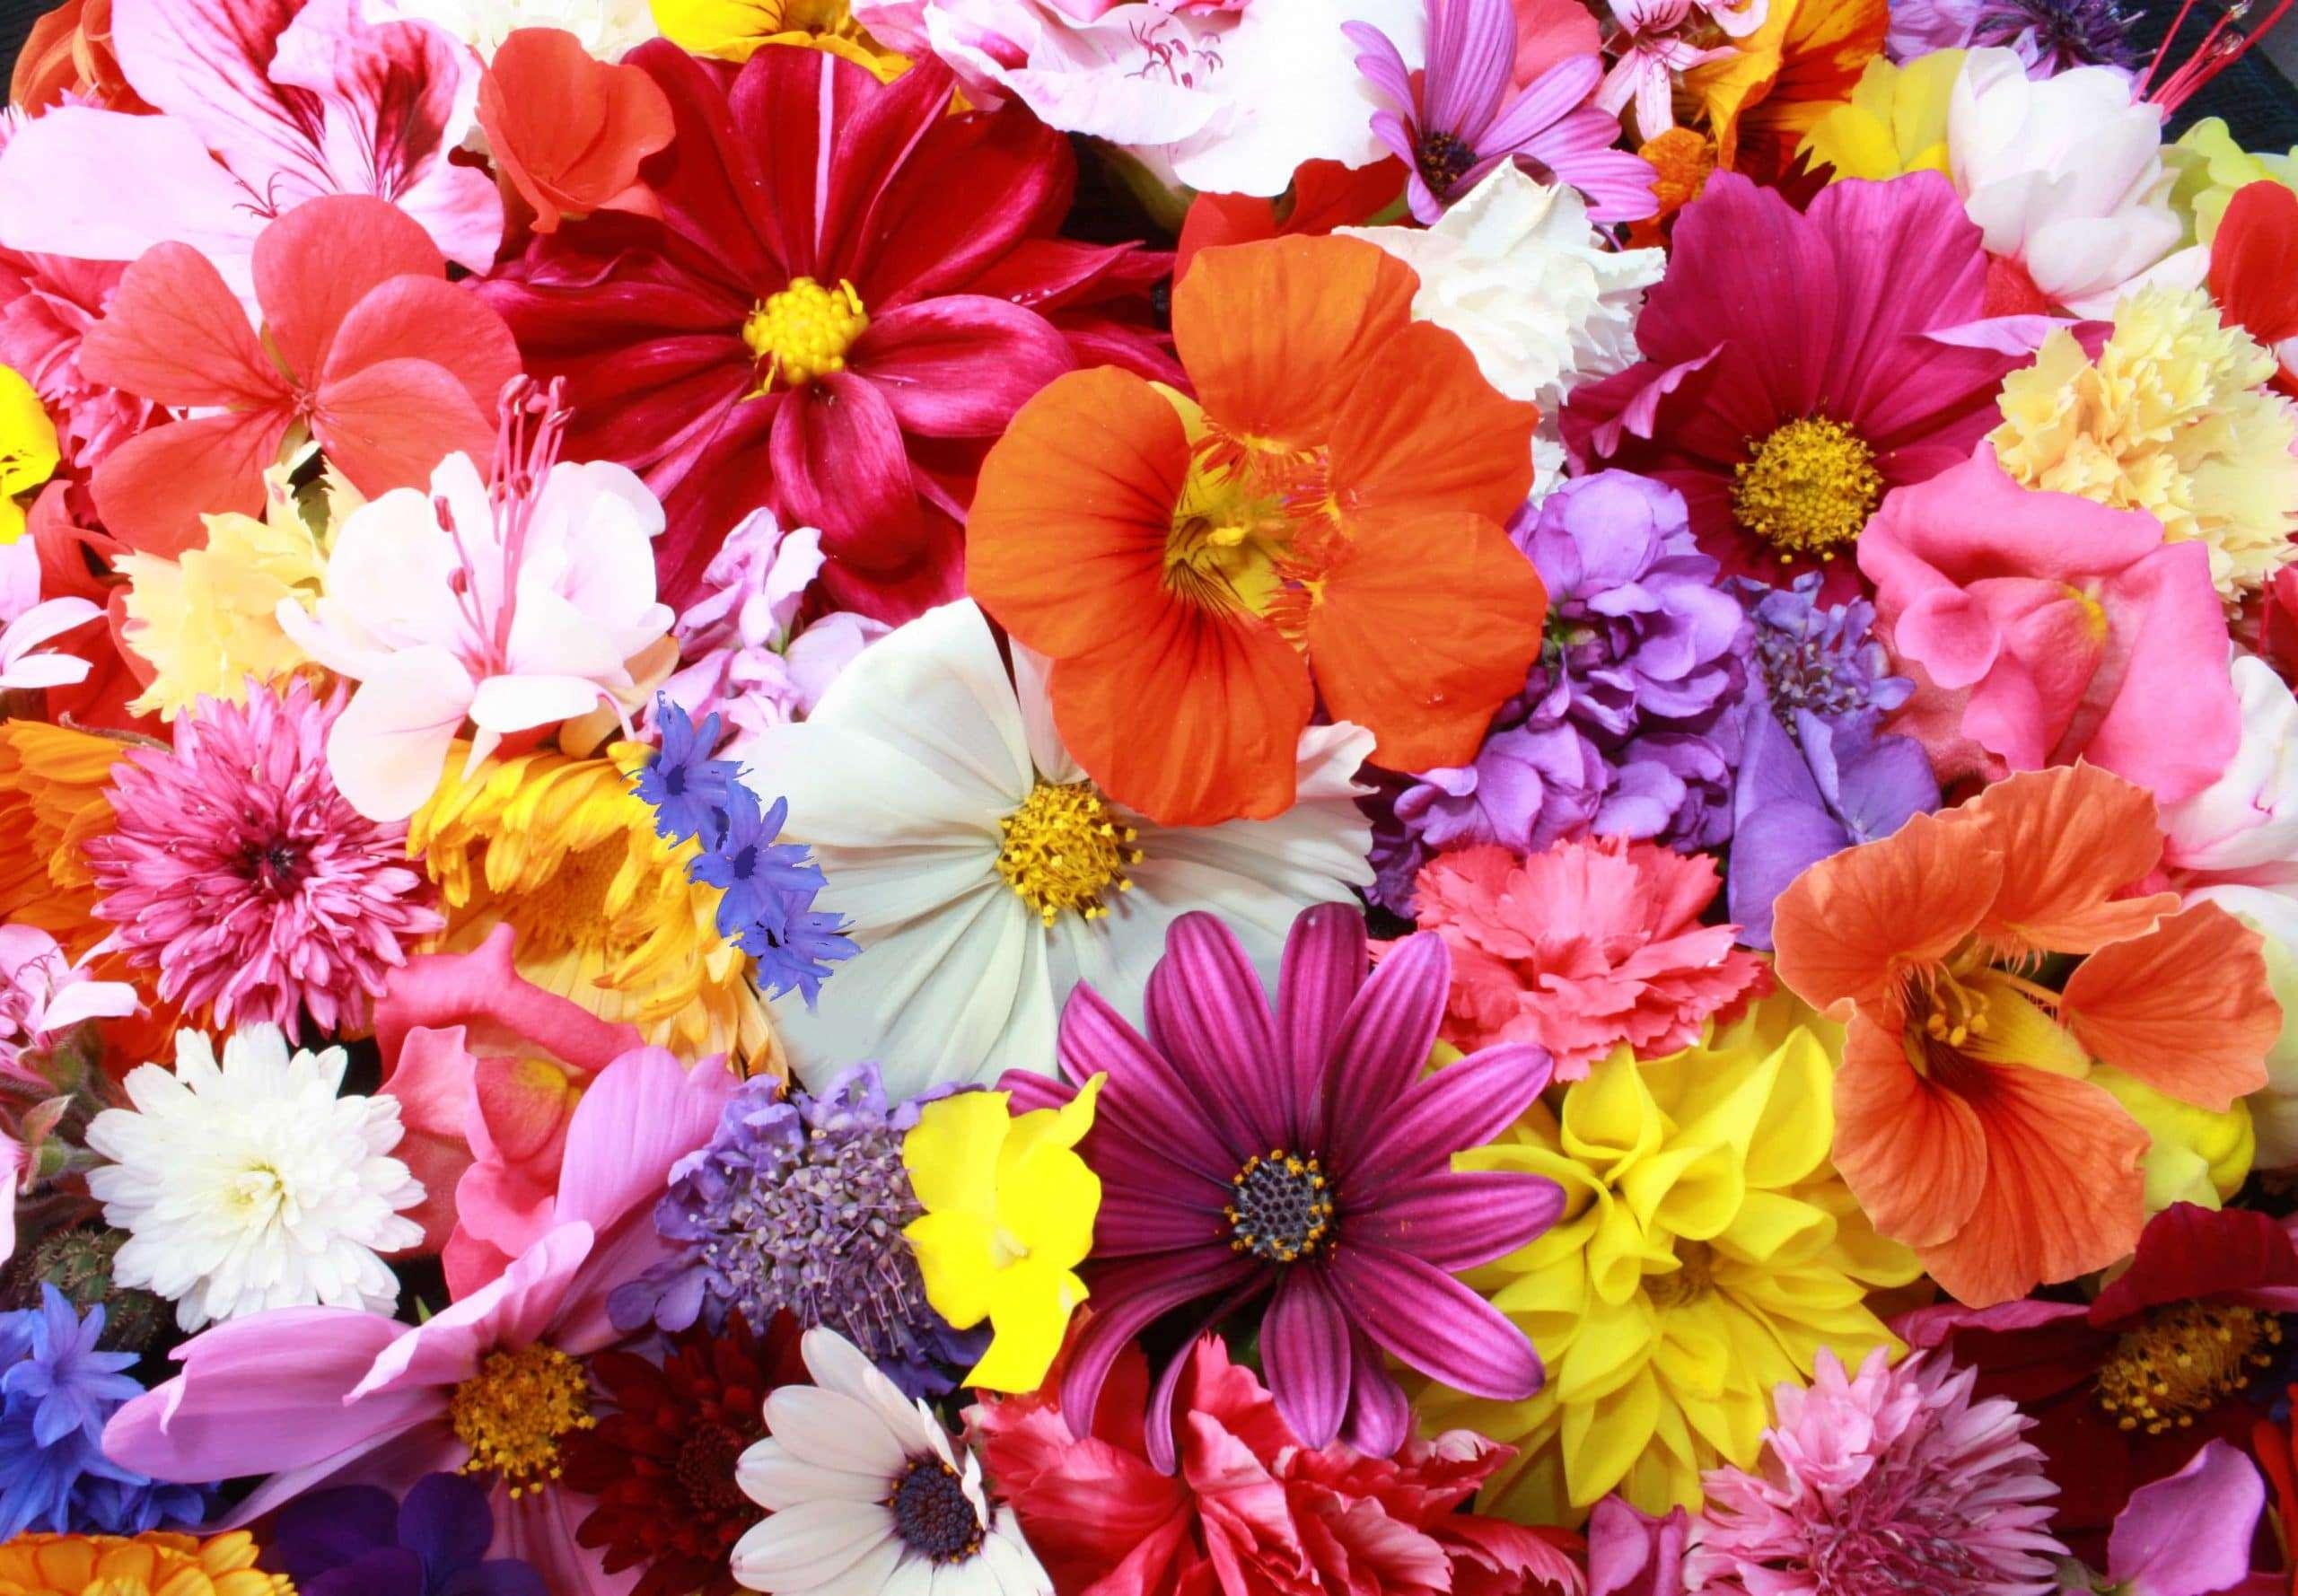 Immagini belle di fiori 47 foto sfondi hd for Immagini di fiori dipinti